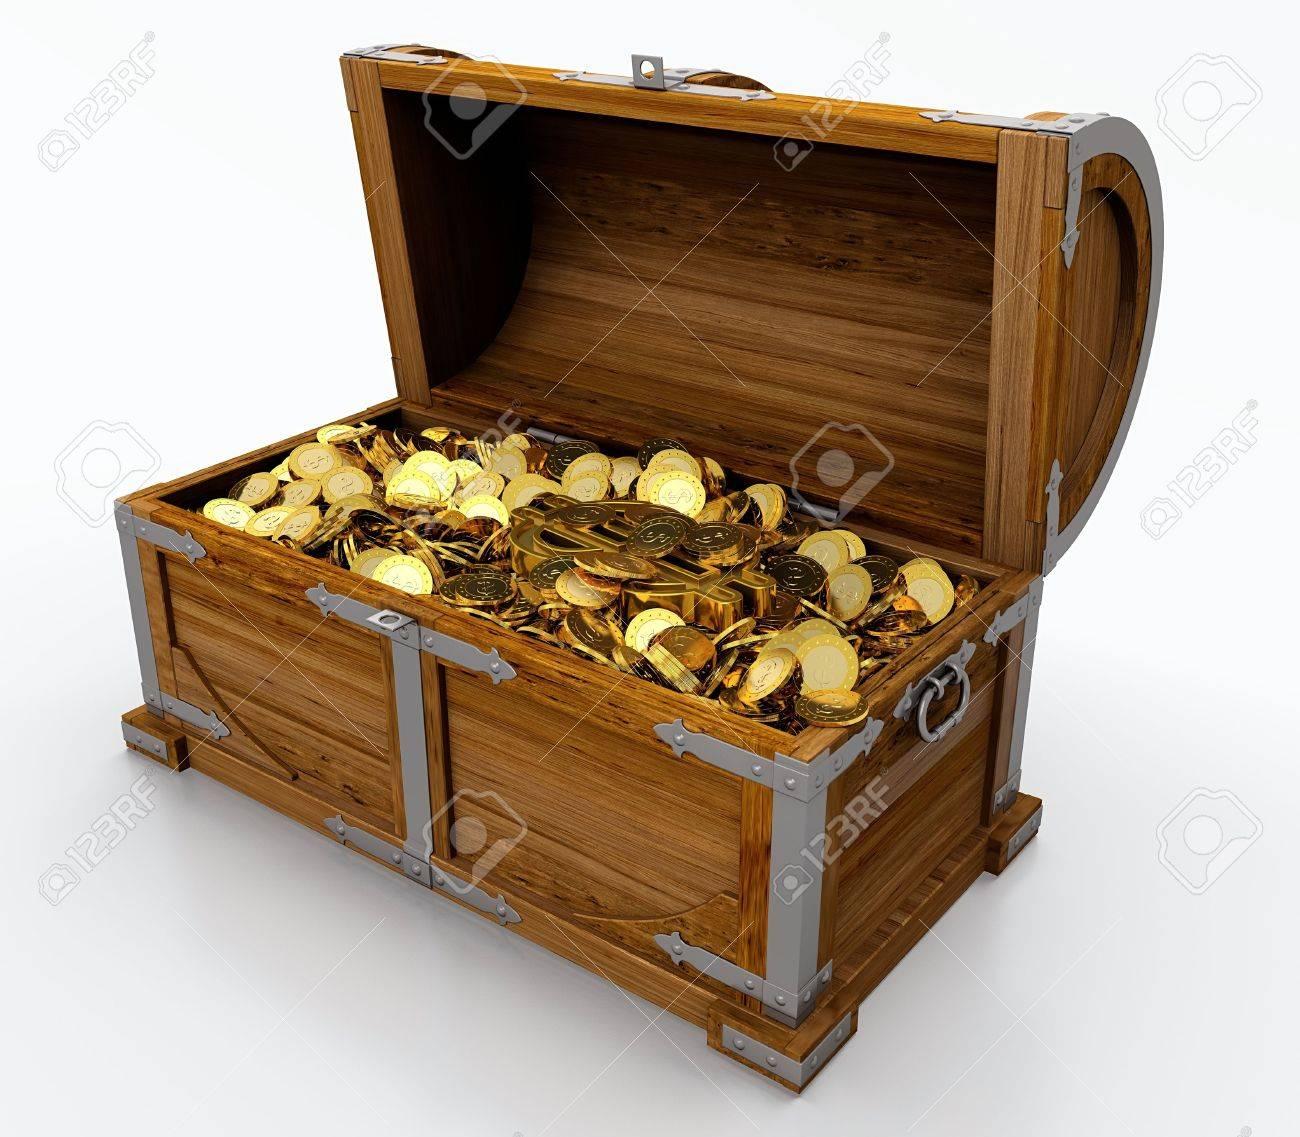 Treasure chest full of golden coins on white background Stock Photo - 13748045